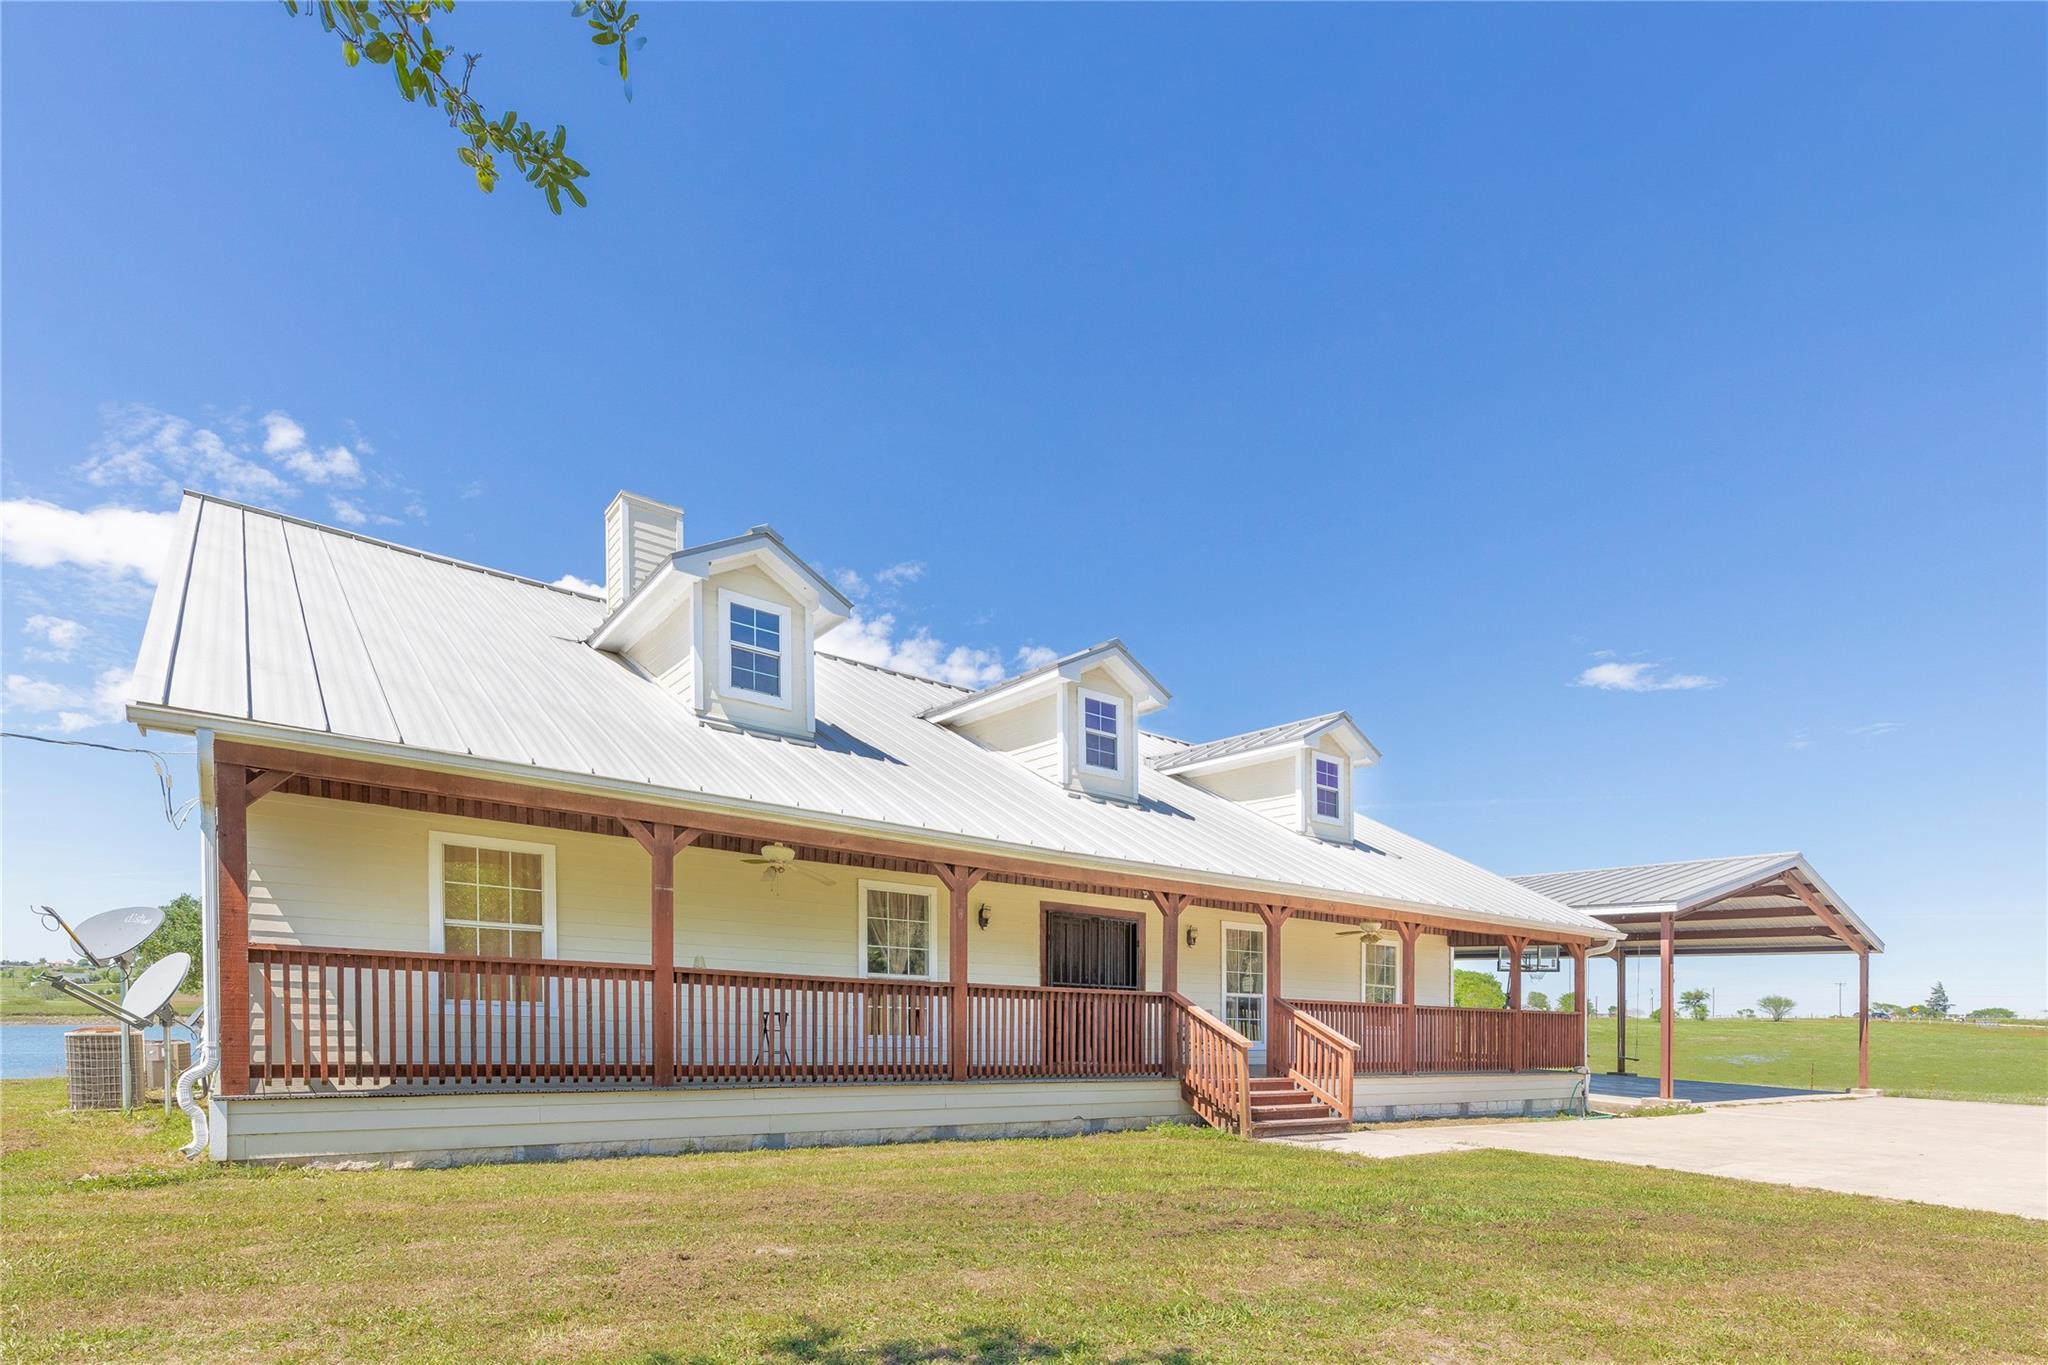 7750 S Texas 77 Property Photo